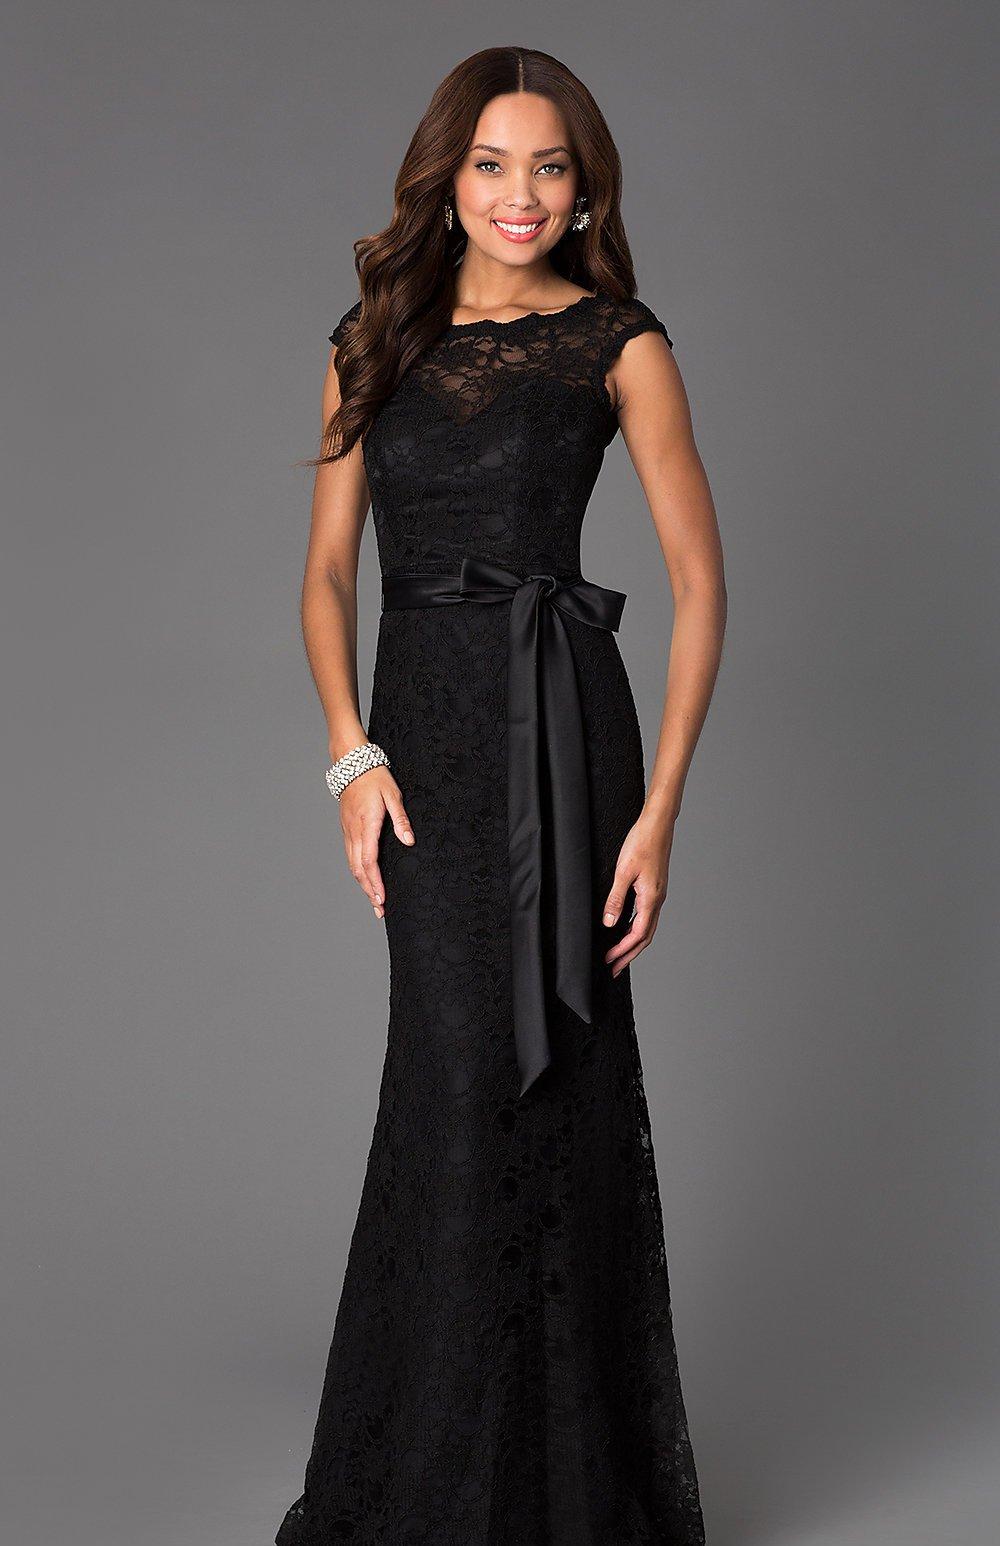 Black Long Prom Dresses